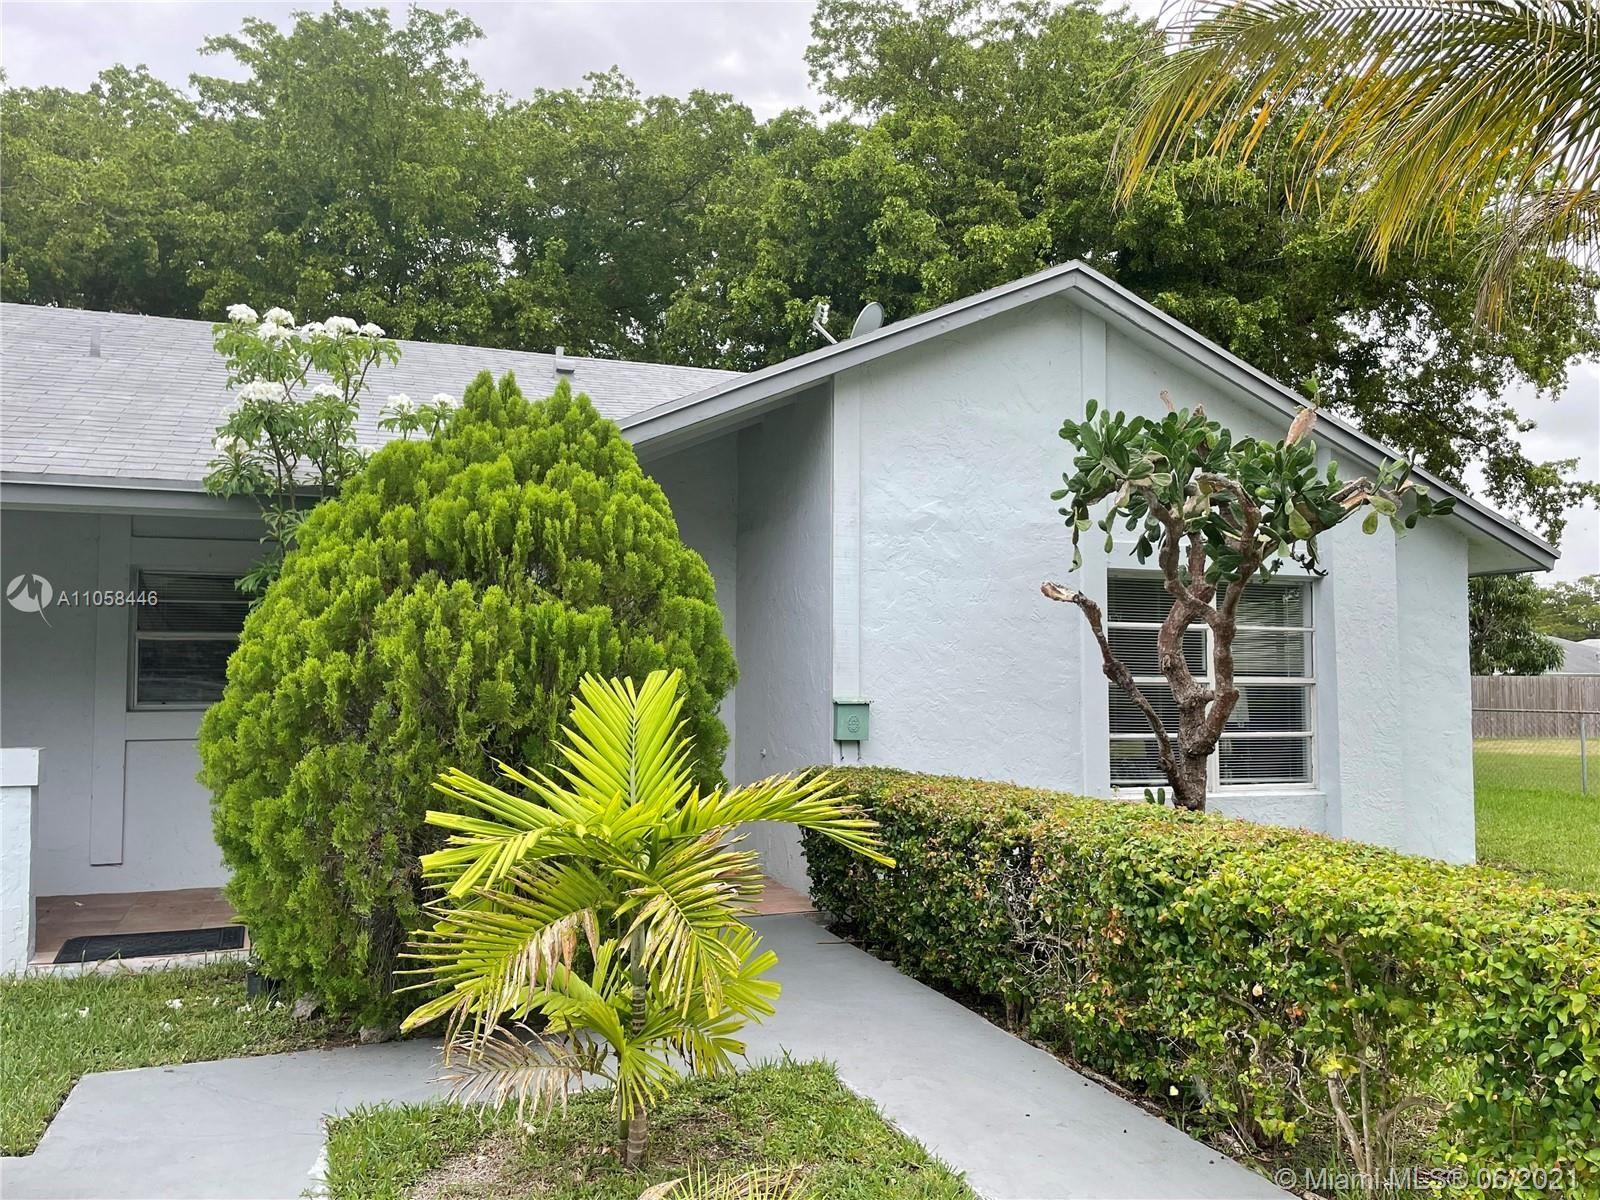 Photo of 6530 SW 59 PL #-, South Miami, FL 33143 (MLS # A11058446)